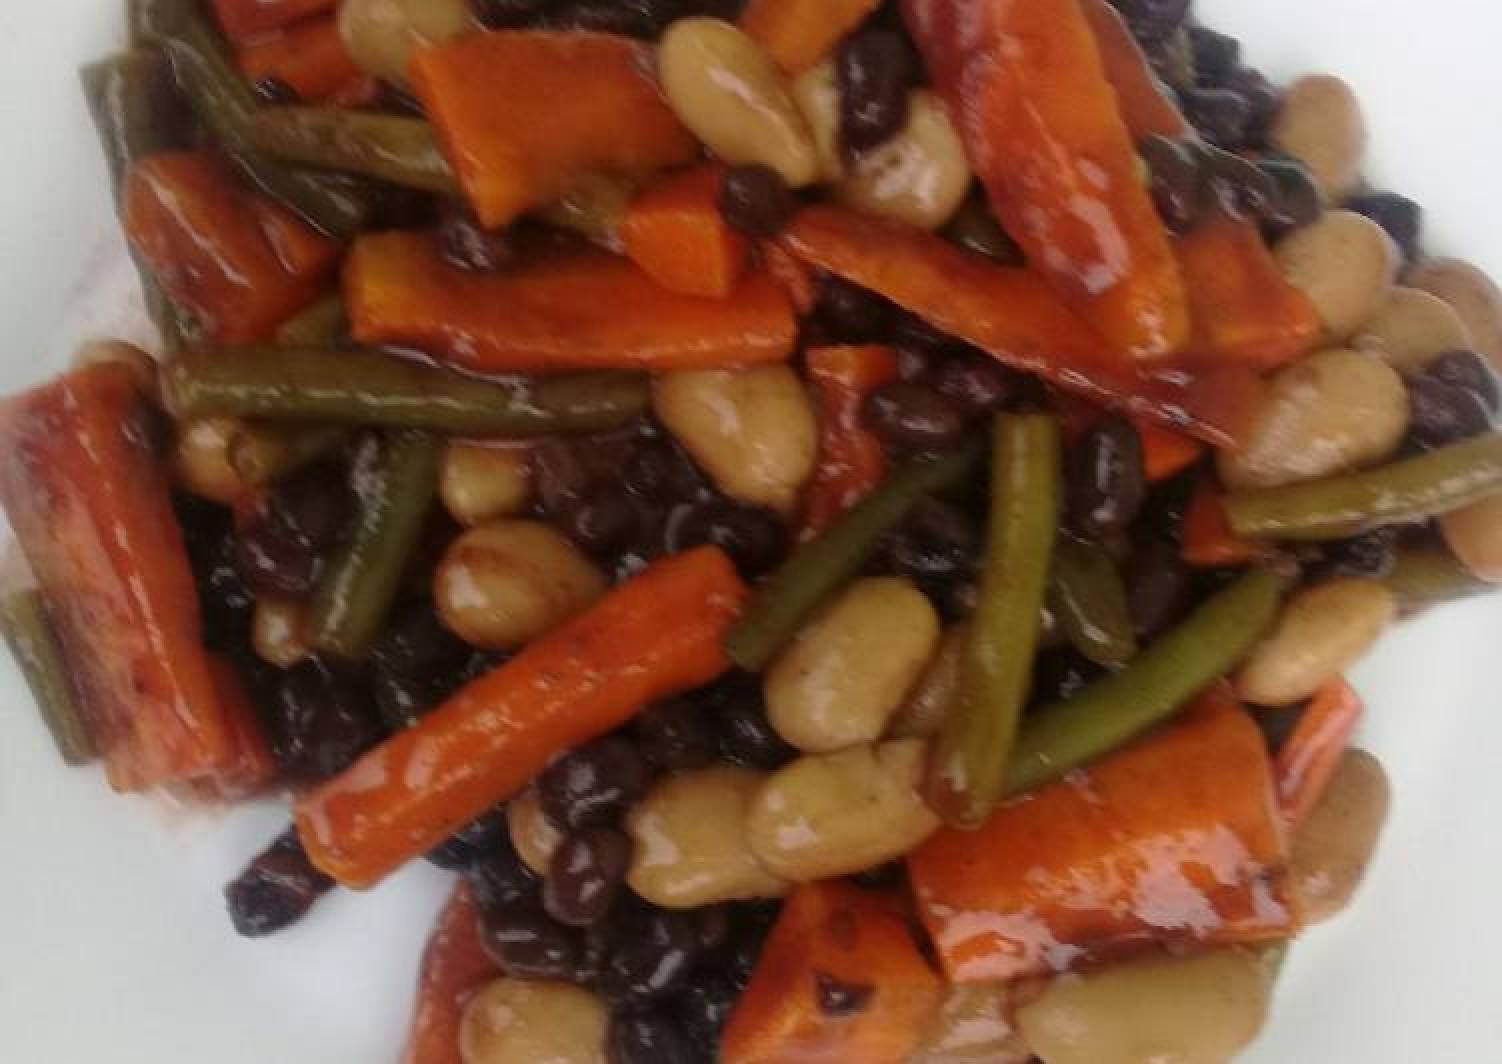 Beans & carrot salad